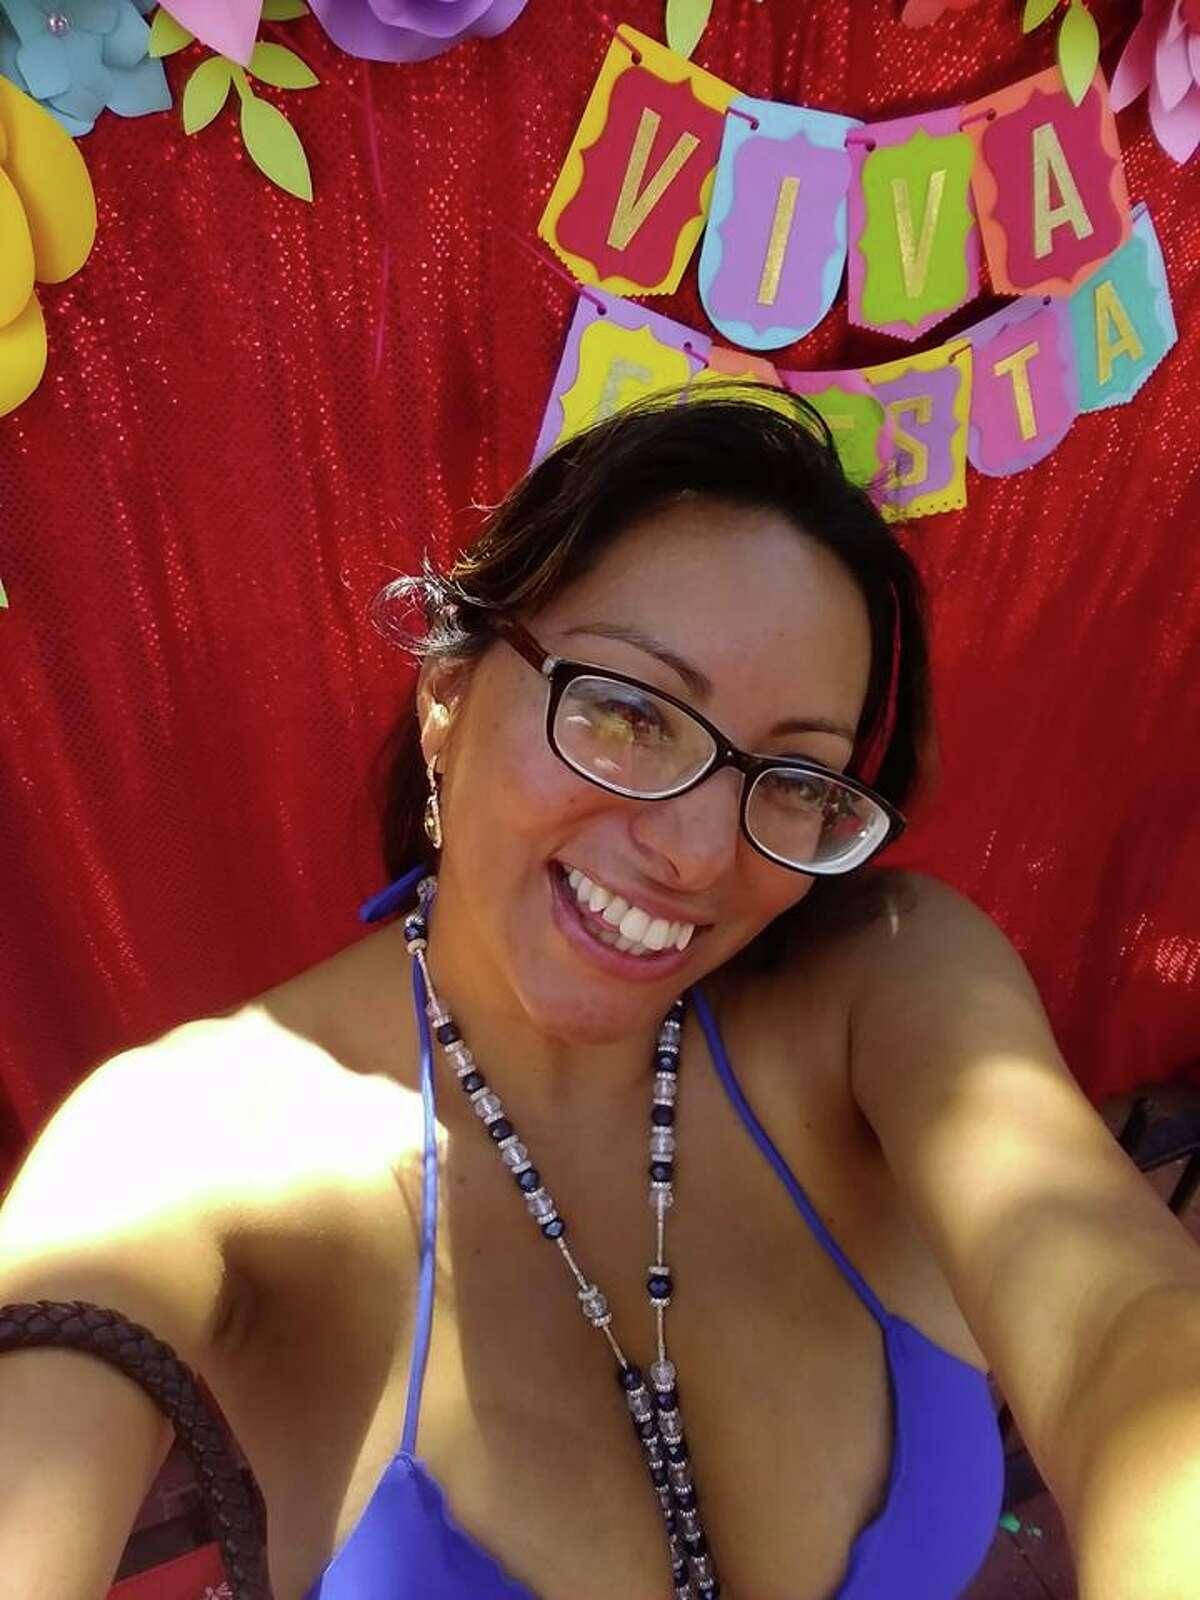 Meet Marquita Richarte, also known as Alondra, also known as Kartel Azteca, also known as the